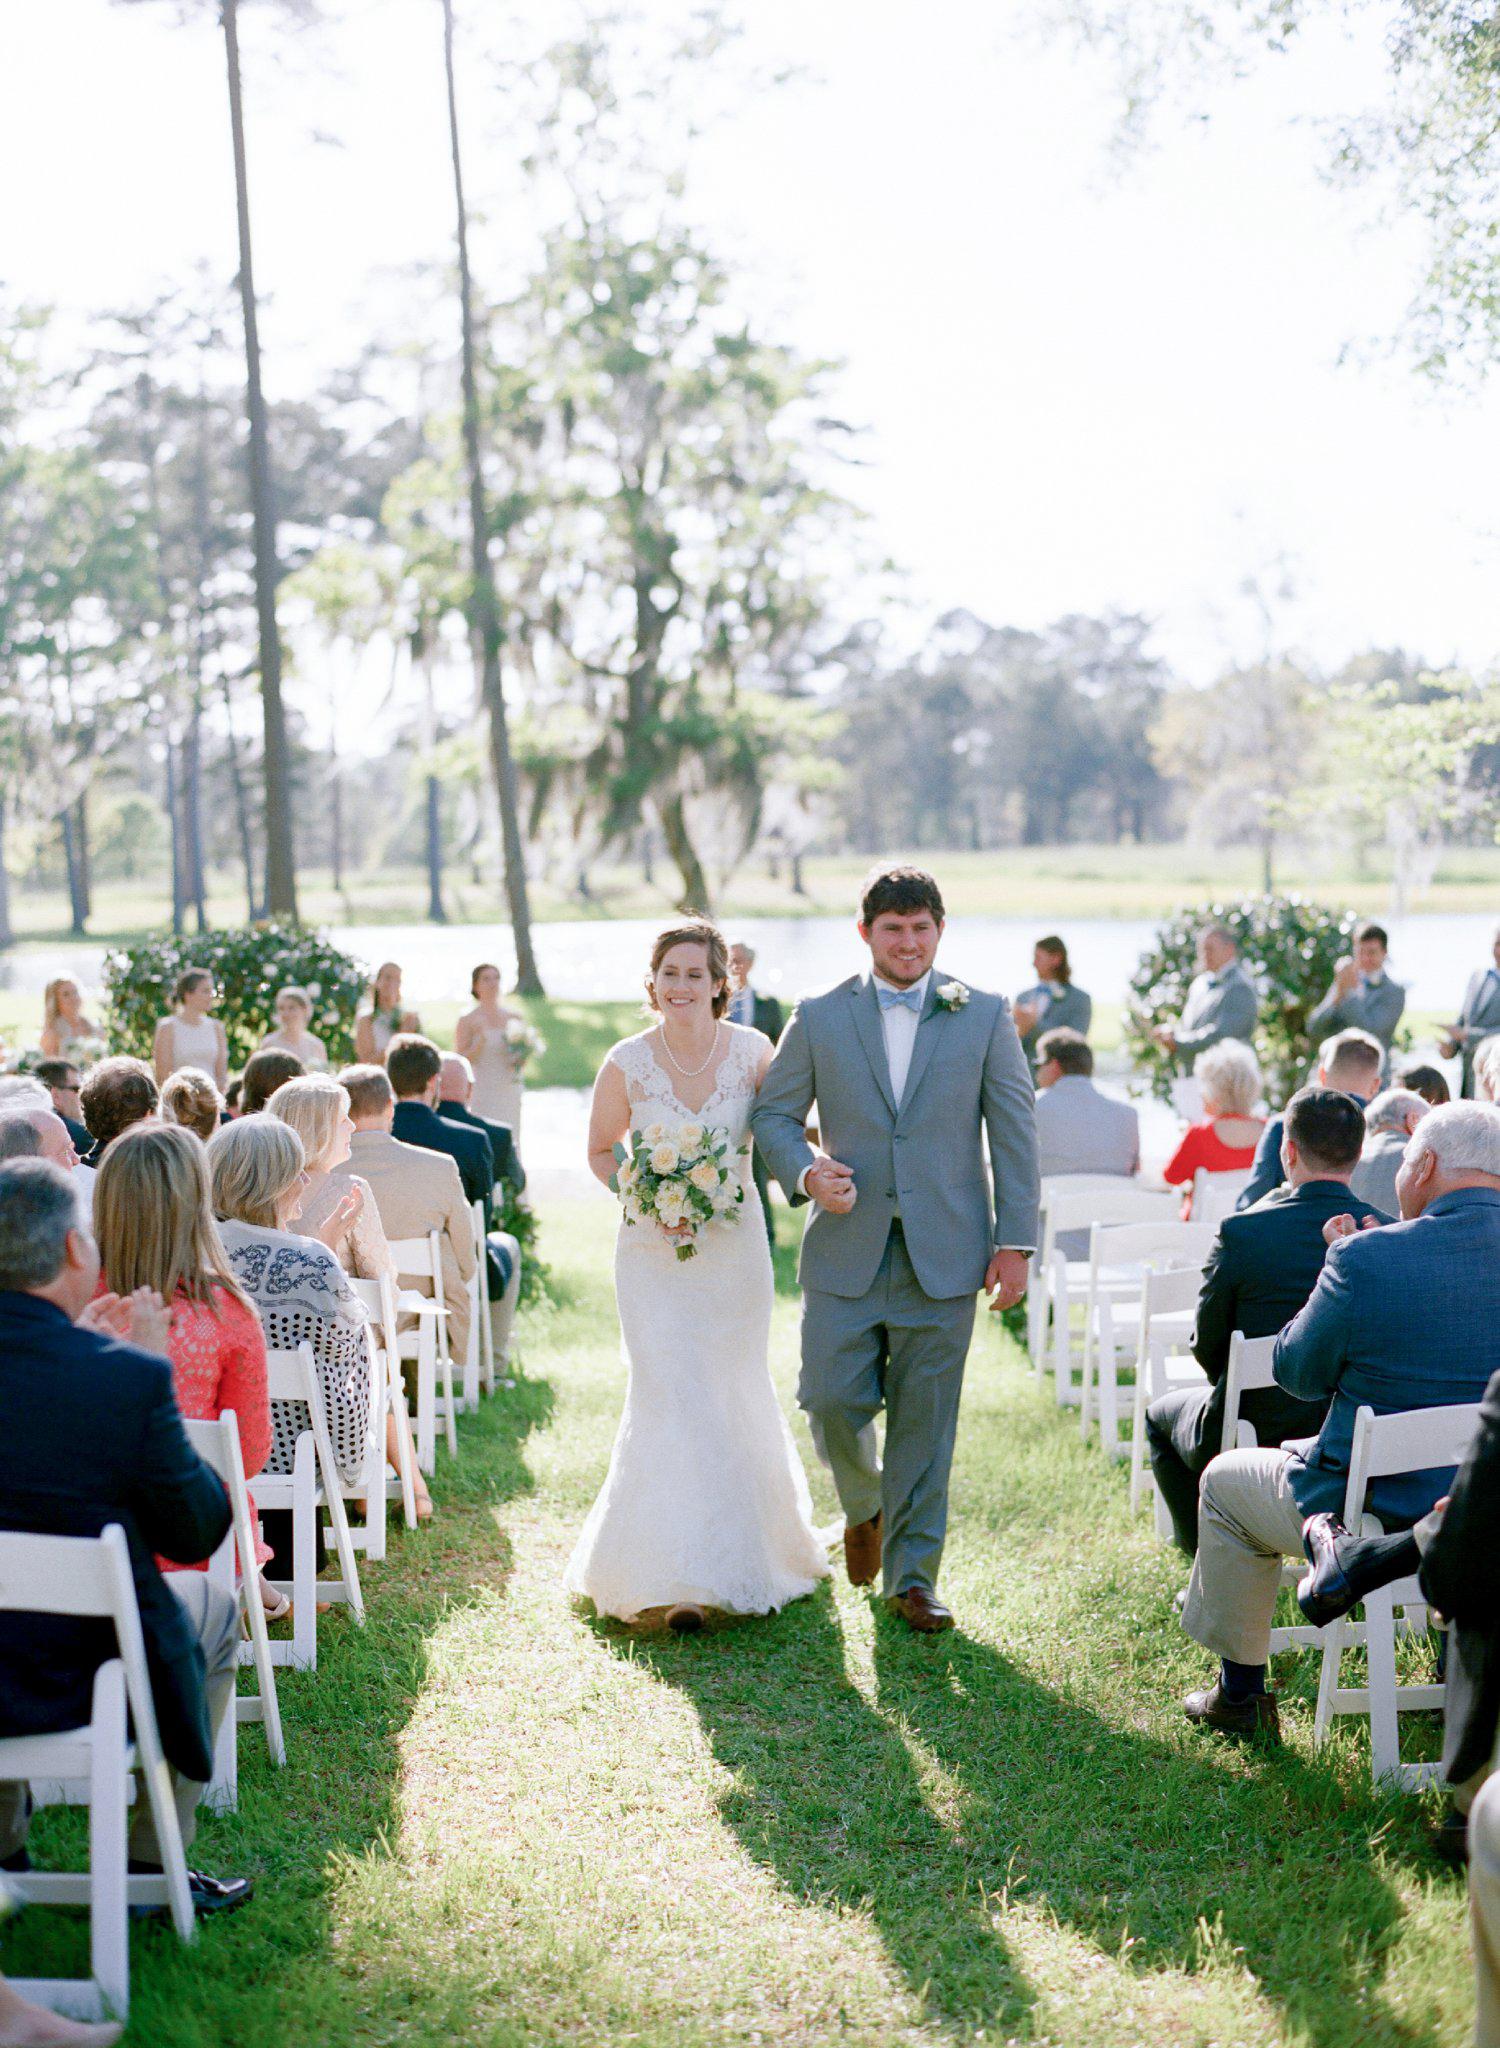 ecila farm wedding albany georgia wedding photographer shannon griffin photography-75.jpg